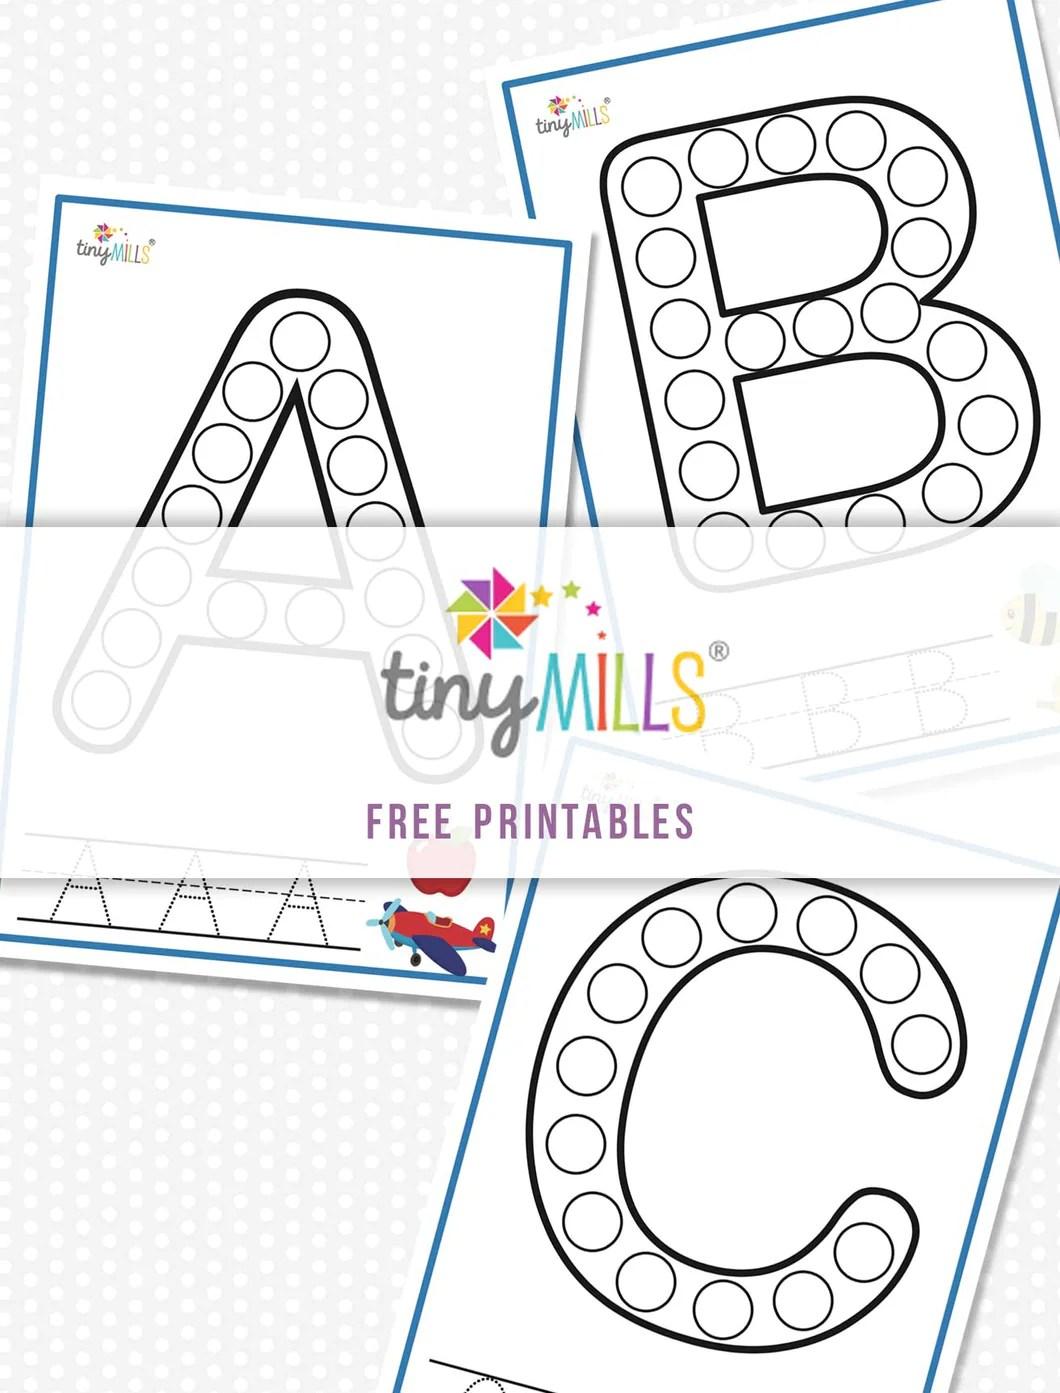 hight resolution of Free Printable Stamp \u0026 Count ABC Worksheet (Full 26 Alphabet) - Tiny Mills®